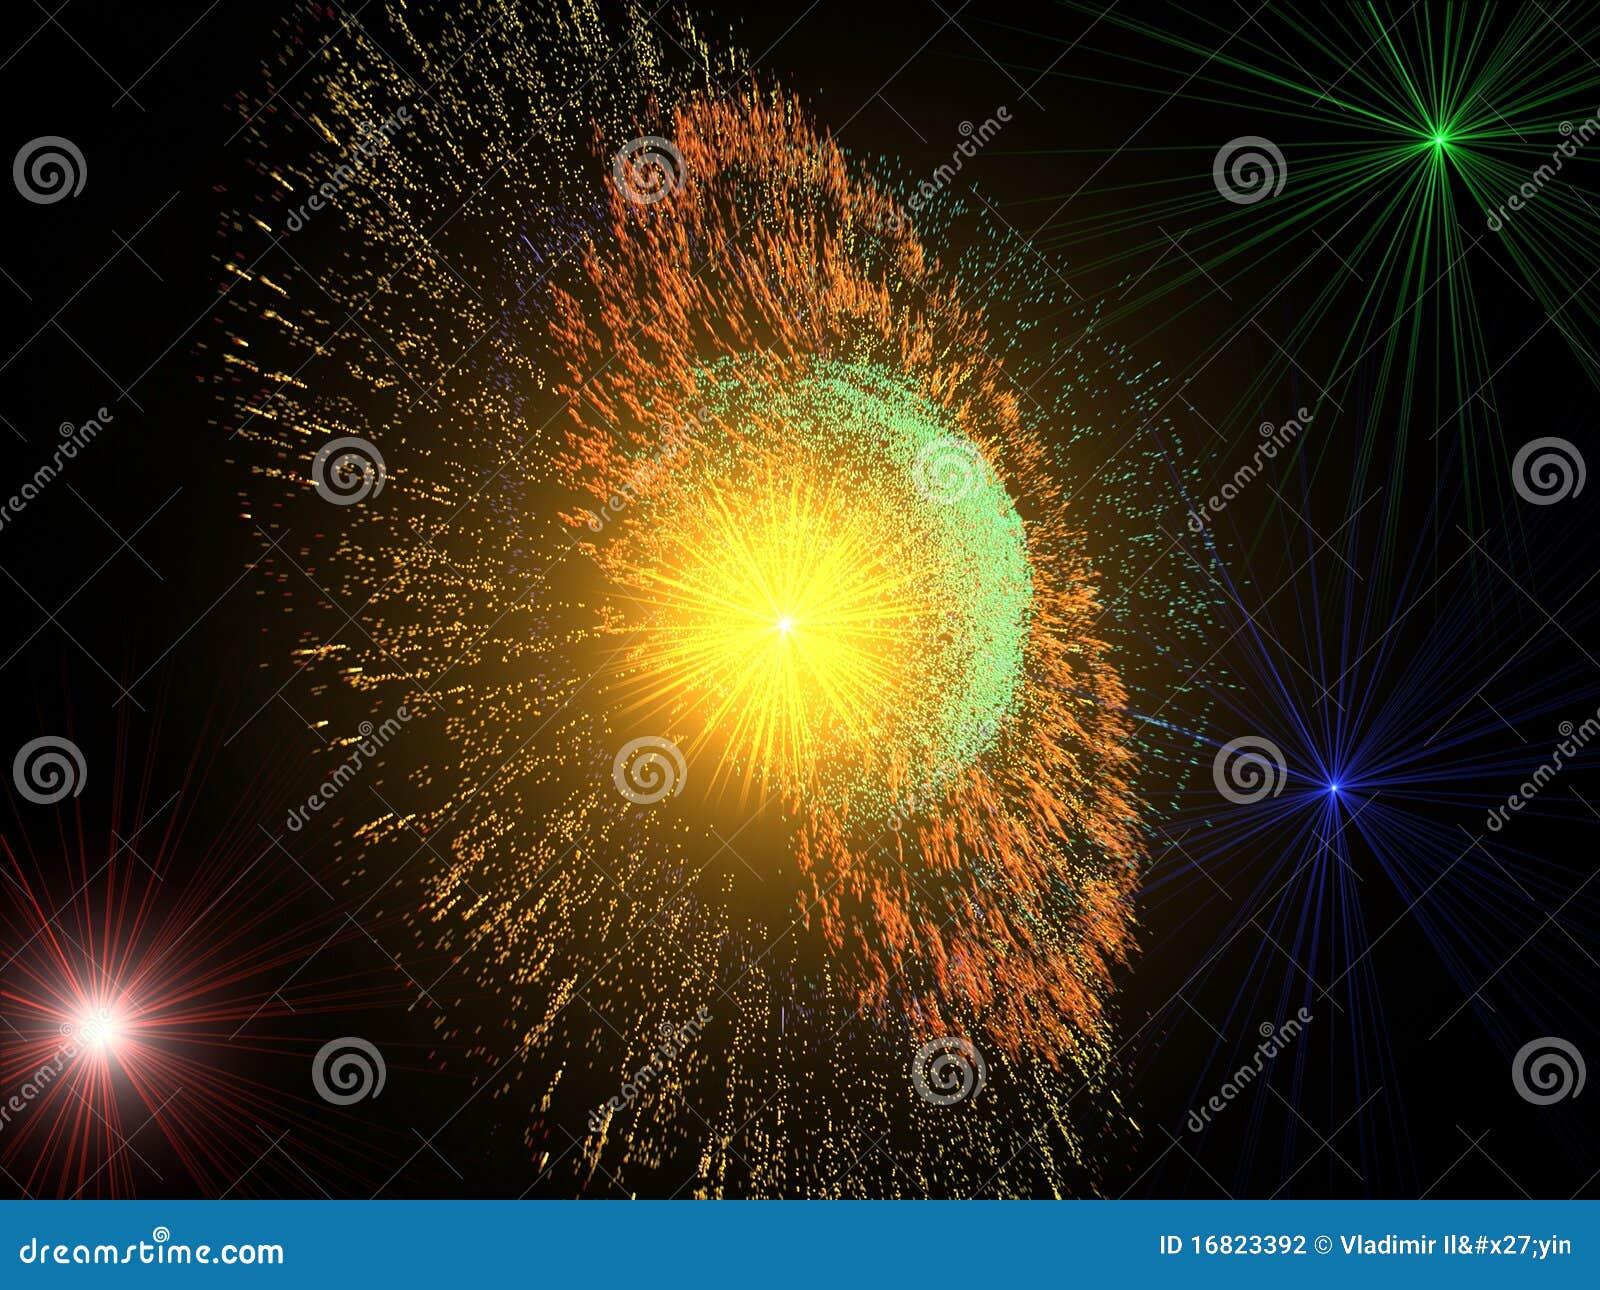 supernova landscape - photo #46